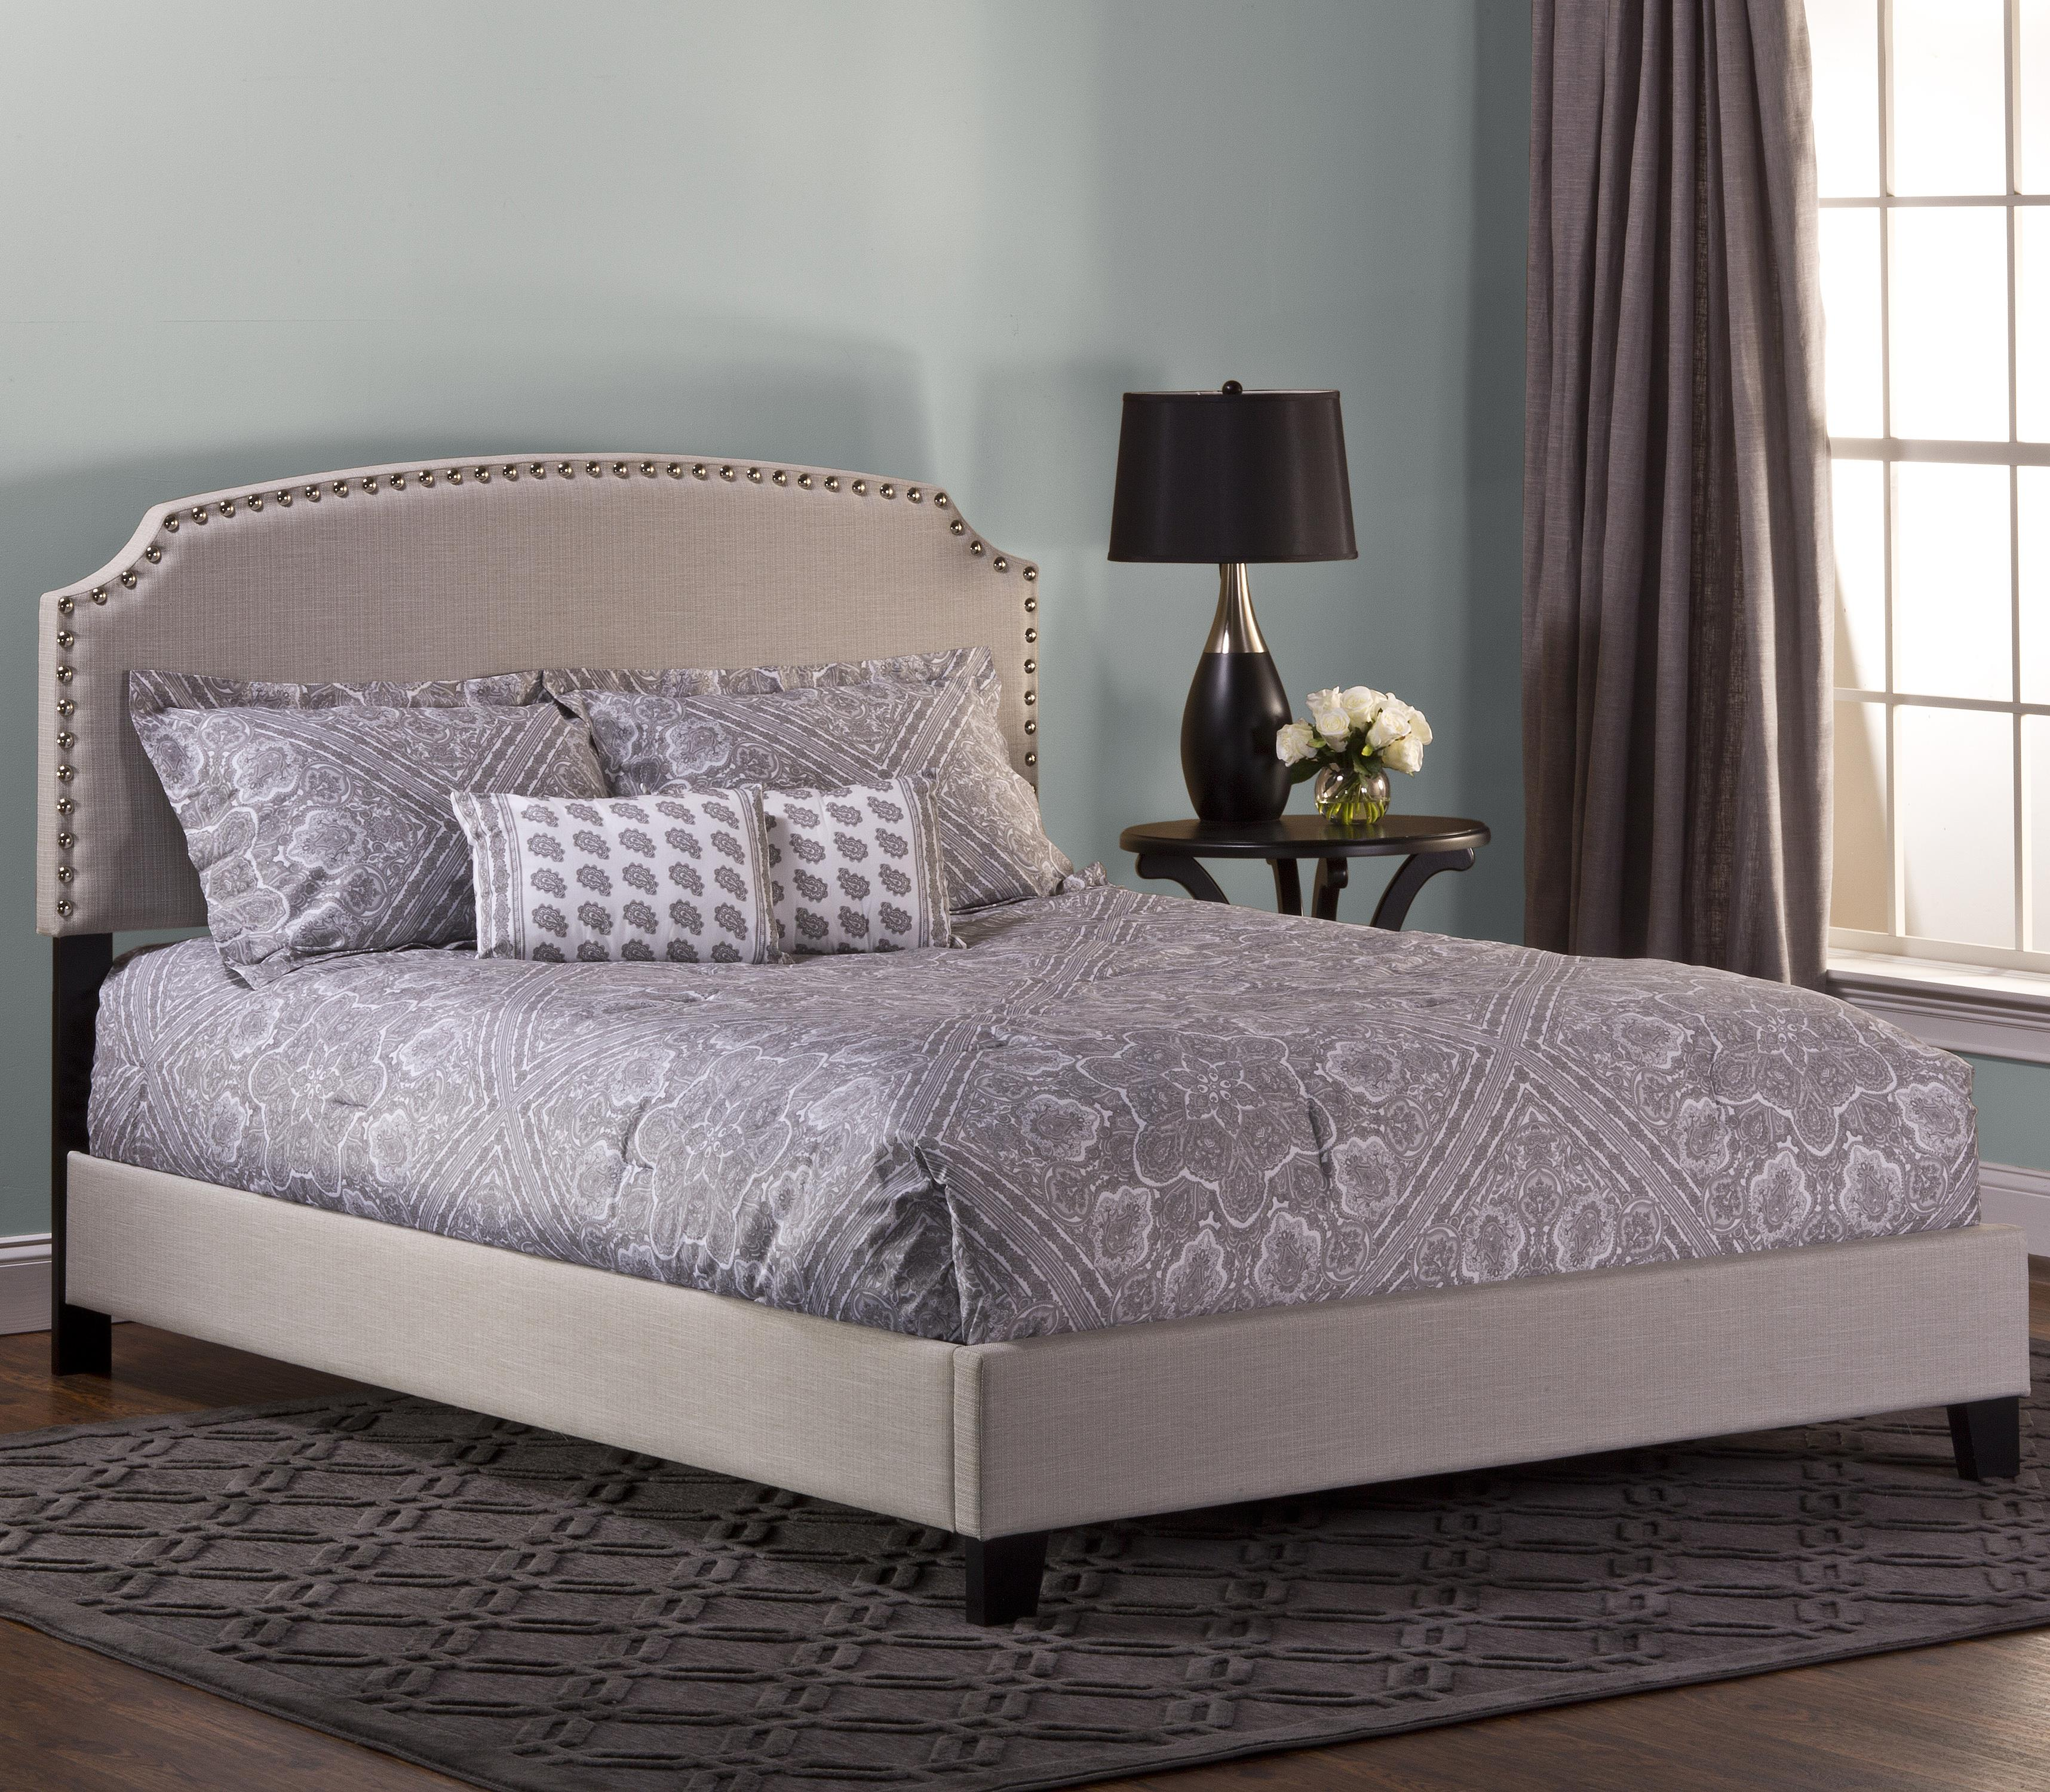 Hillsdale upholstered beds full lani upholstered bed w for Upholstered full bed